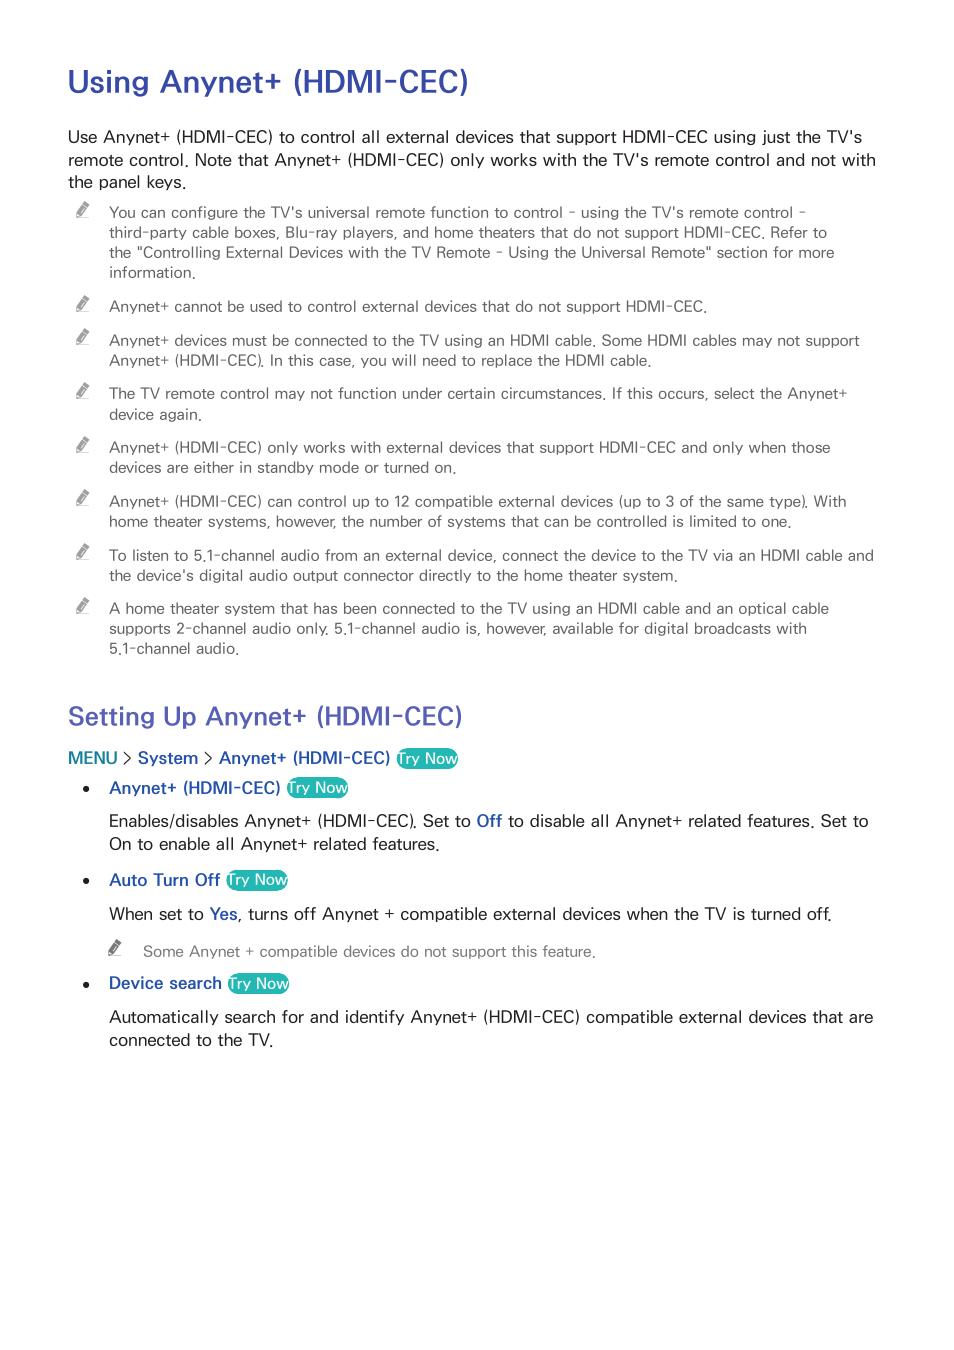 Using anynet+ (hdmi-cec), 168 setting up anynet+ (hdmi-cec